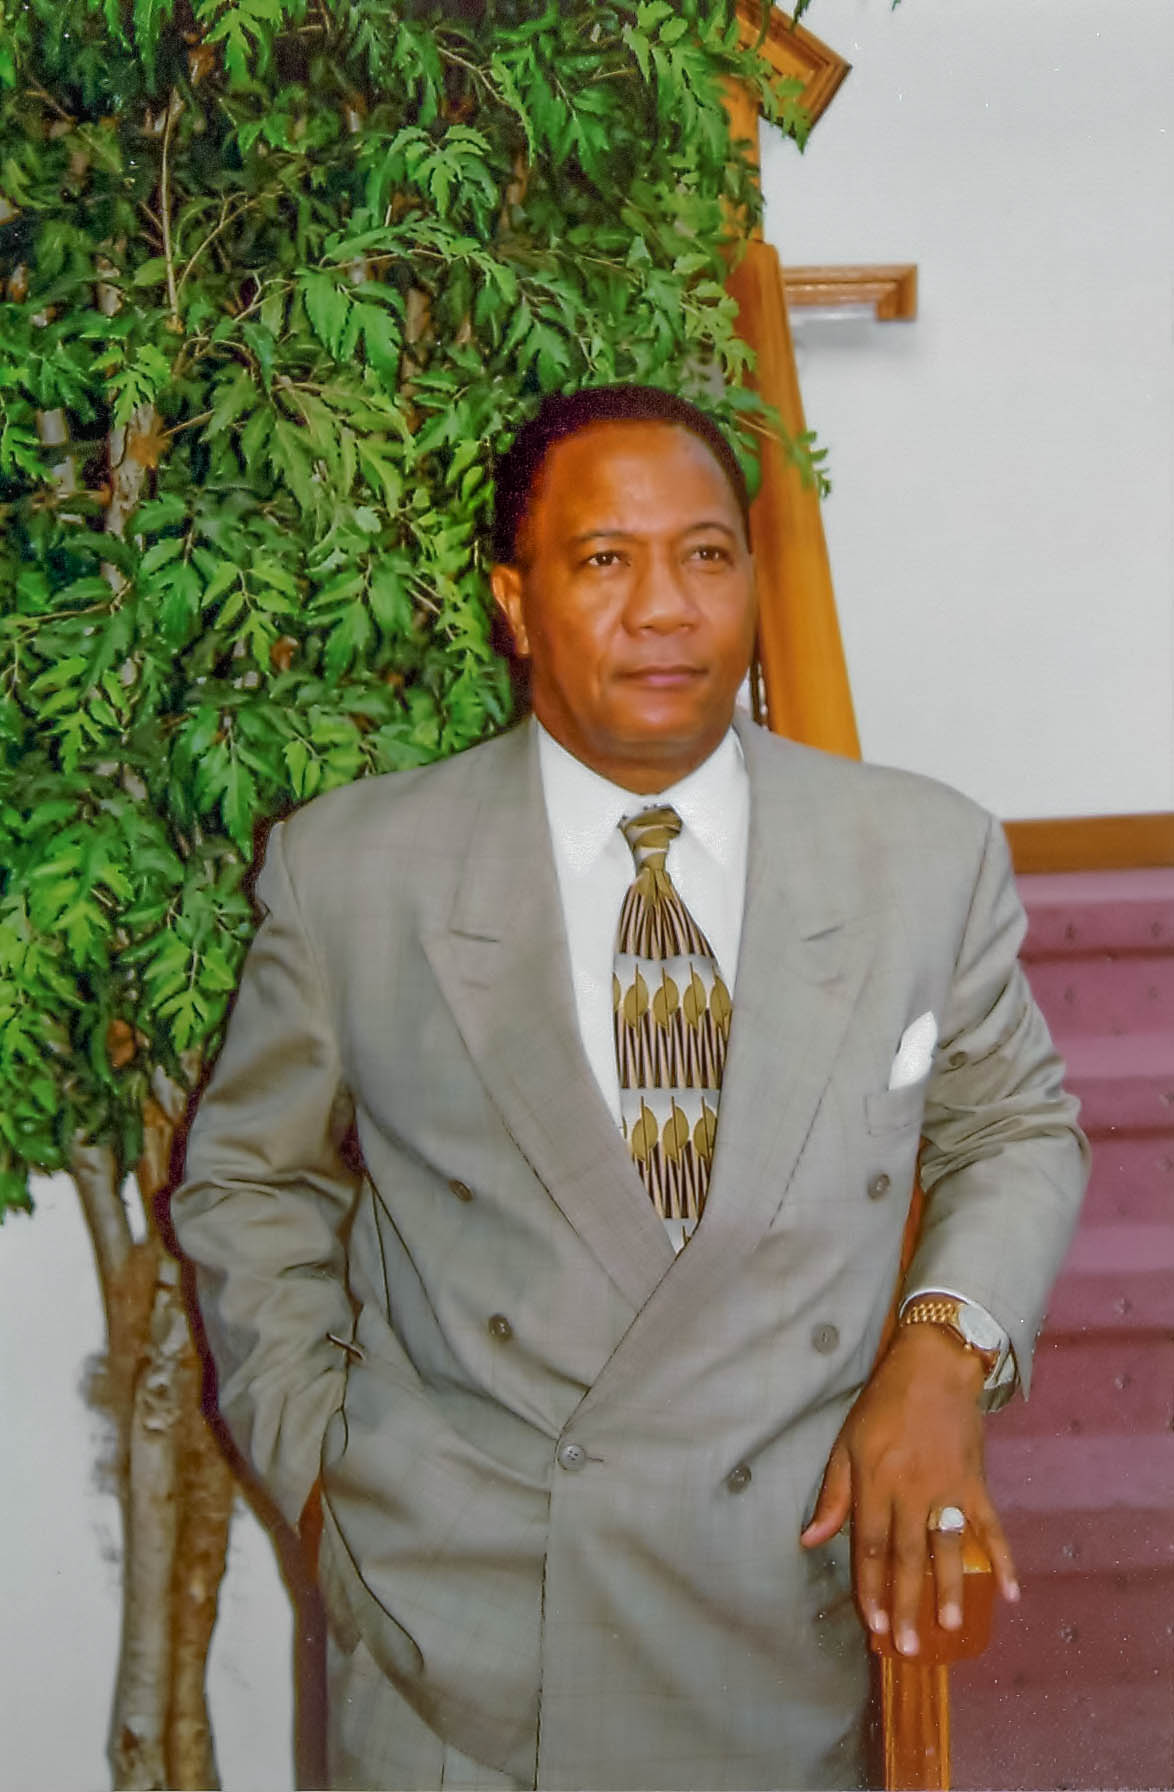 Bishop Lawrence C. Callahan Sr. 1945 - 2001